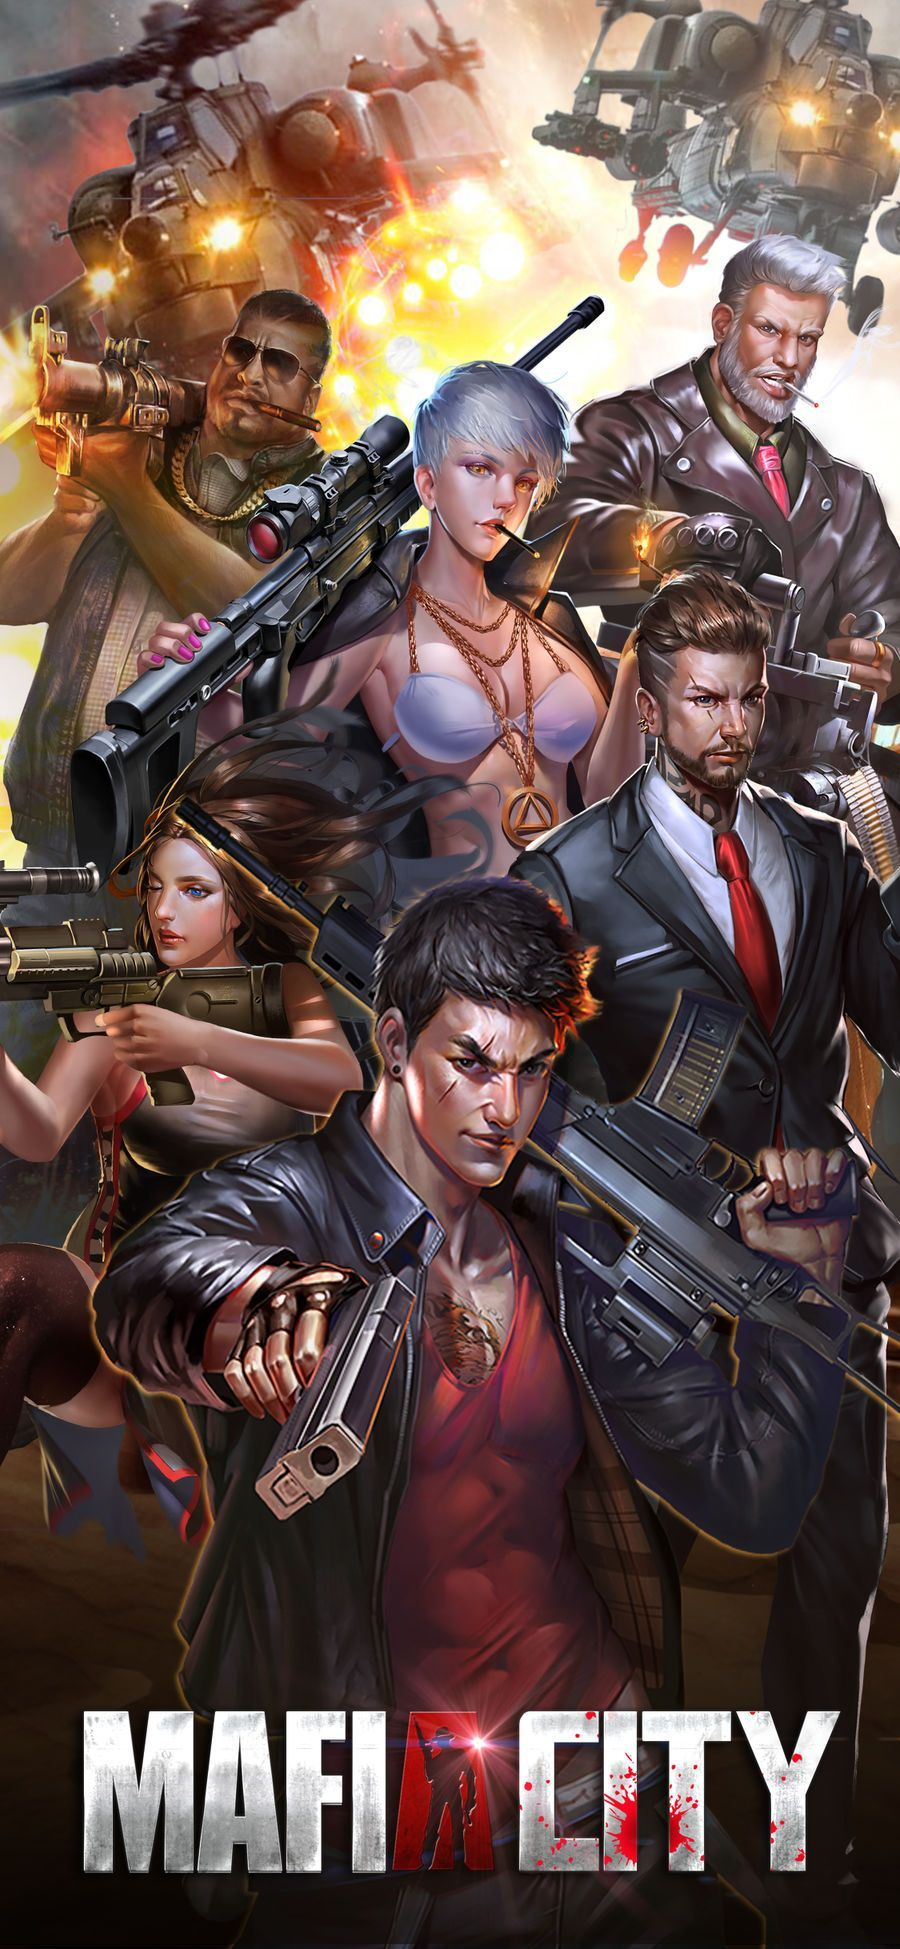 Mafia City play hack iphone Mafia City hack Mafia City